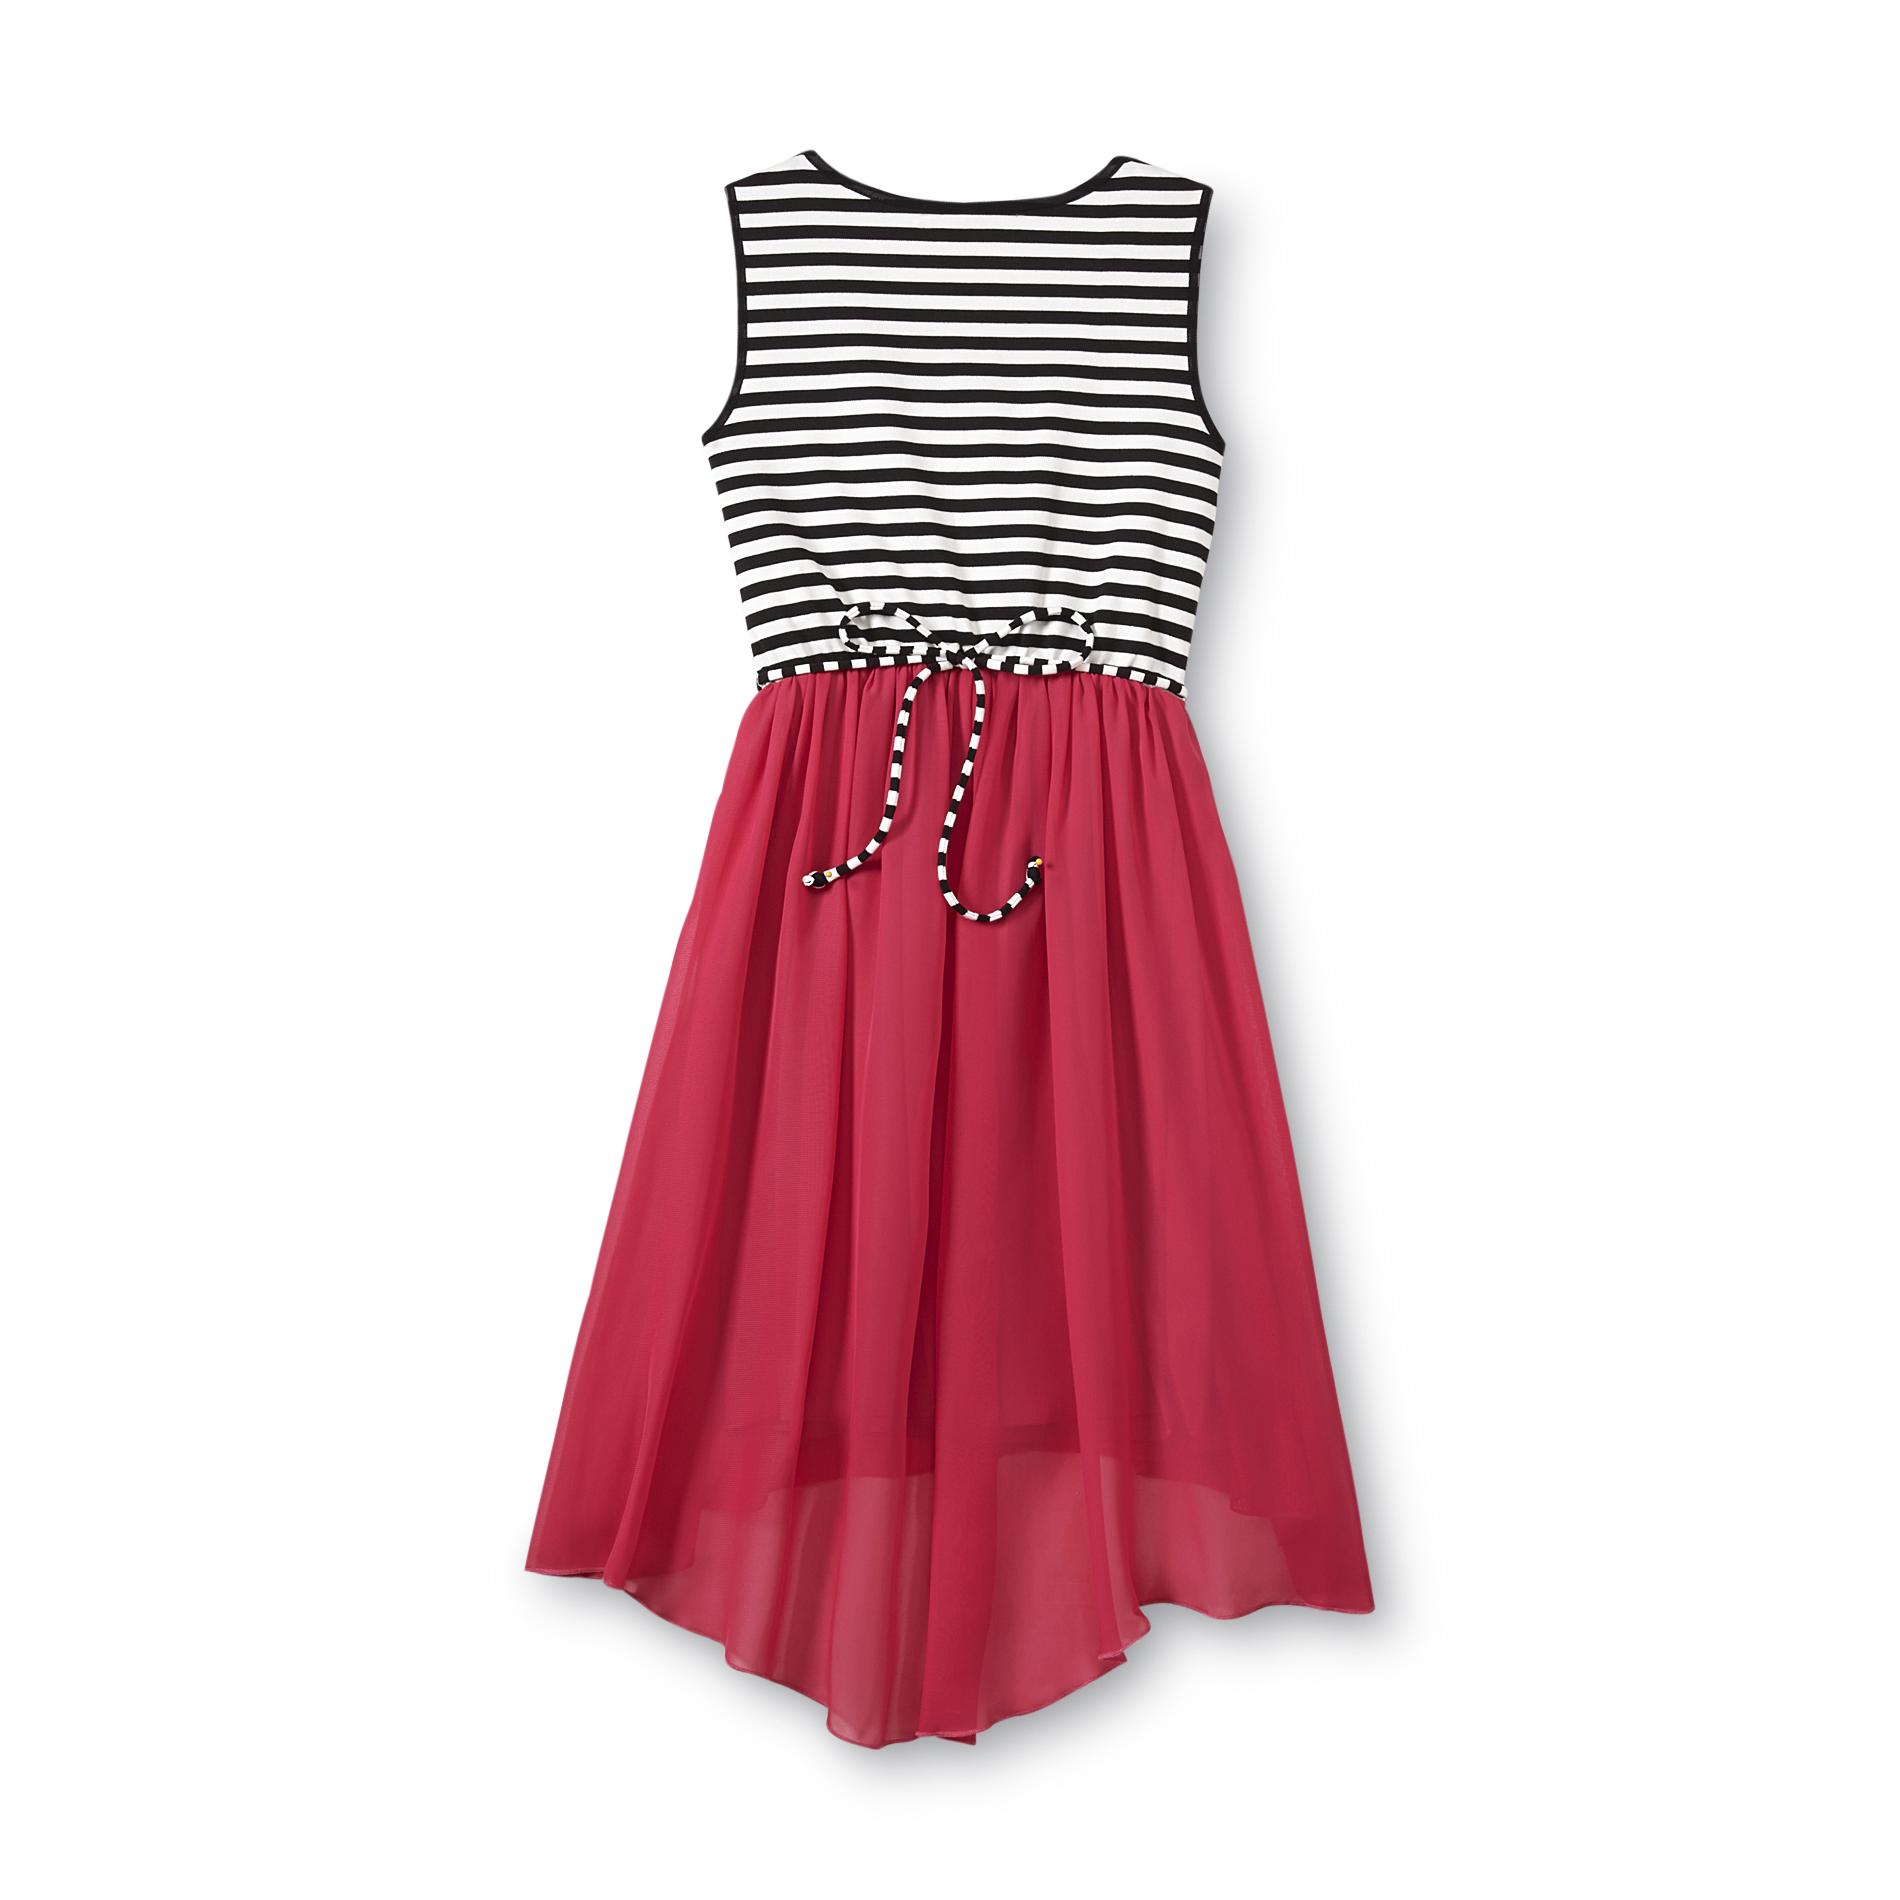 Speechless Girl' Illusion Dress - Striped